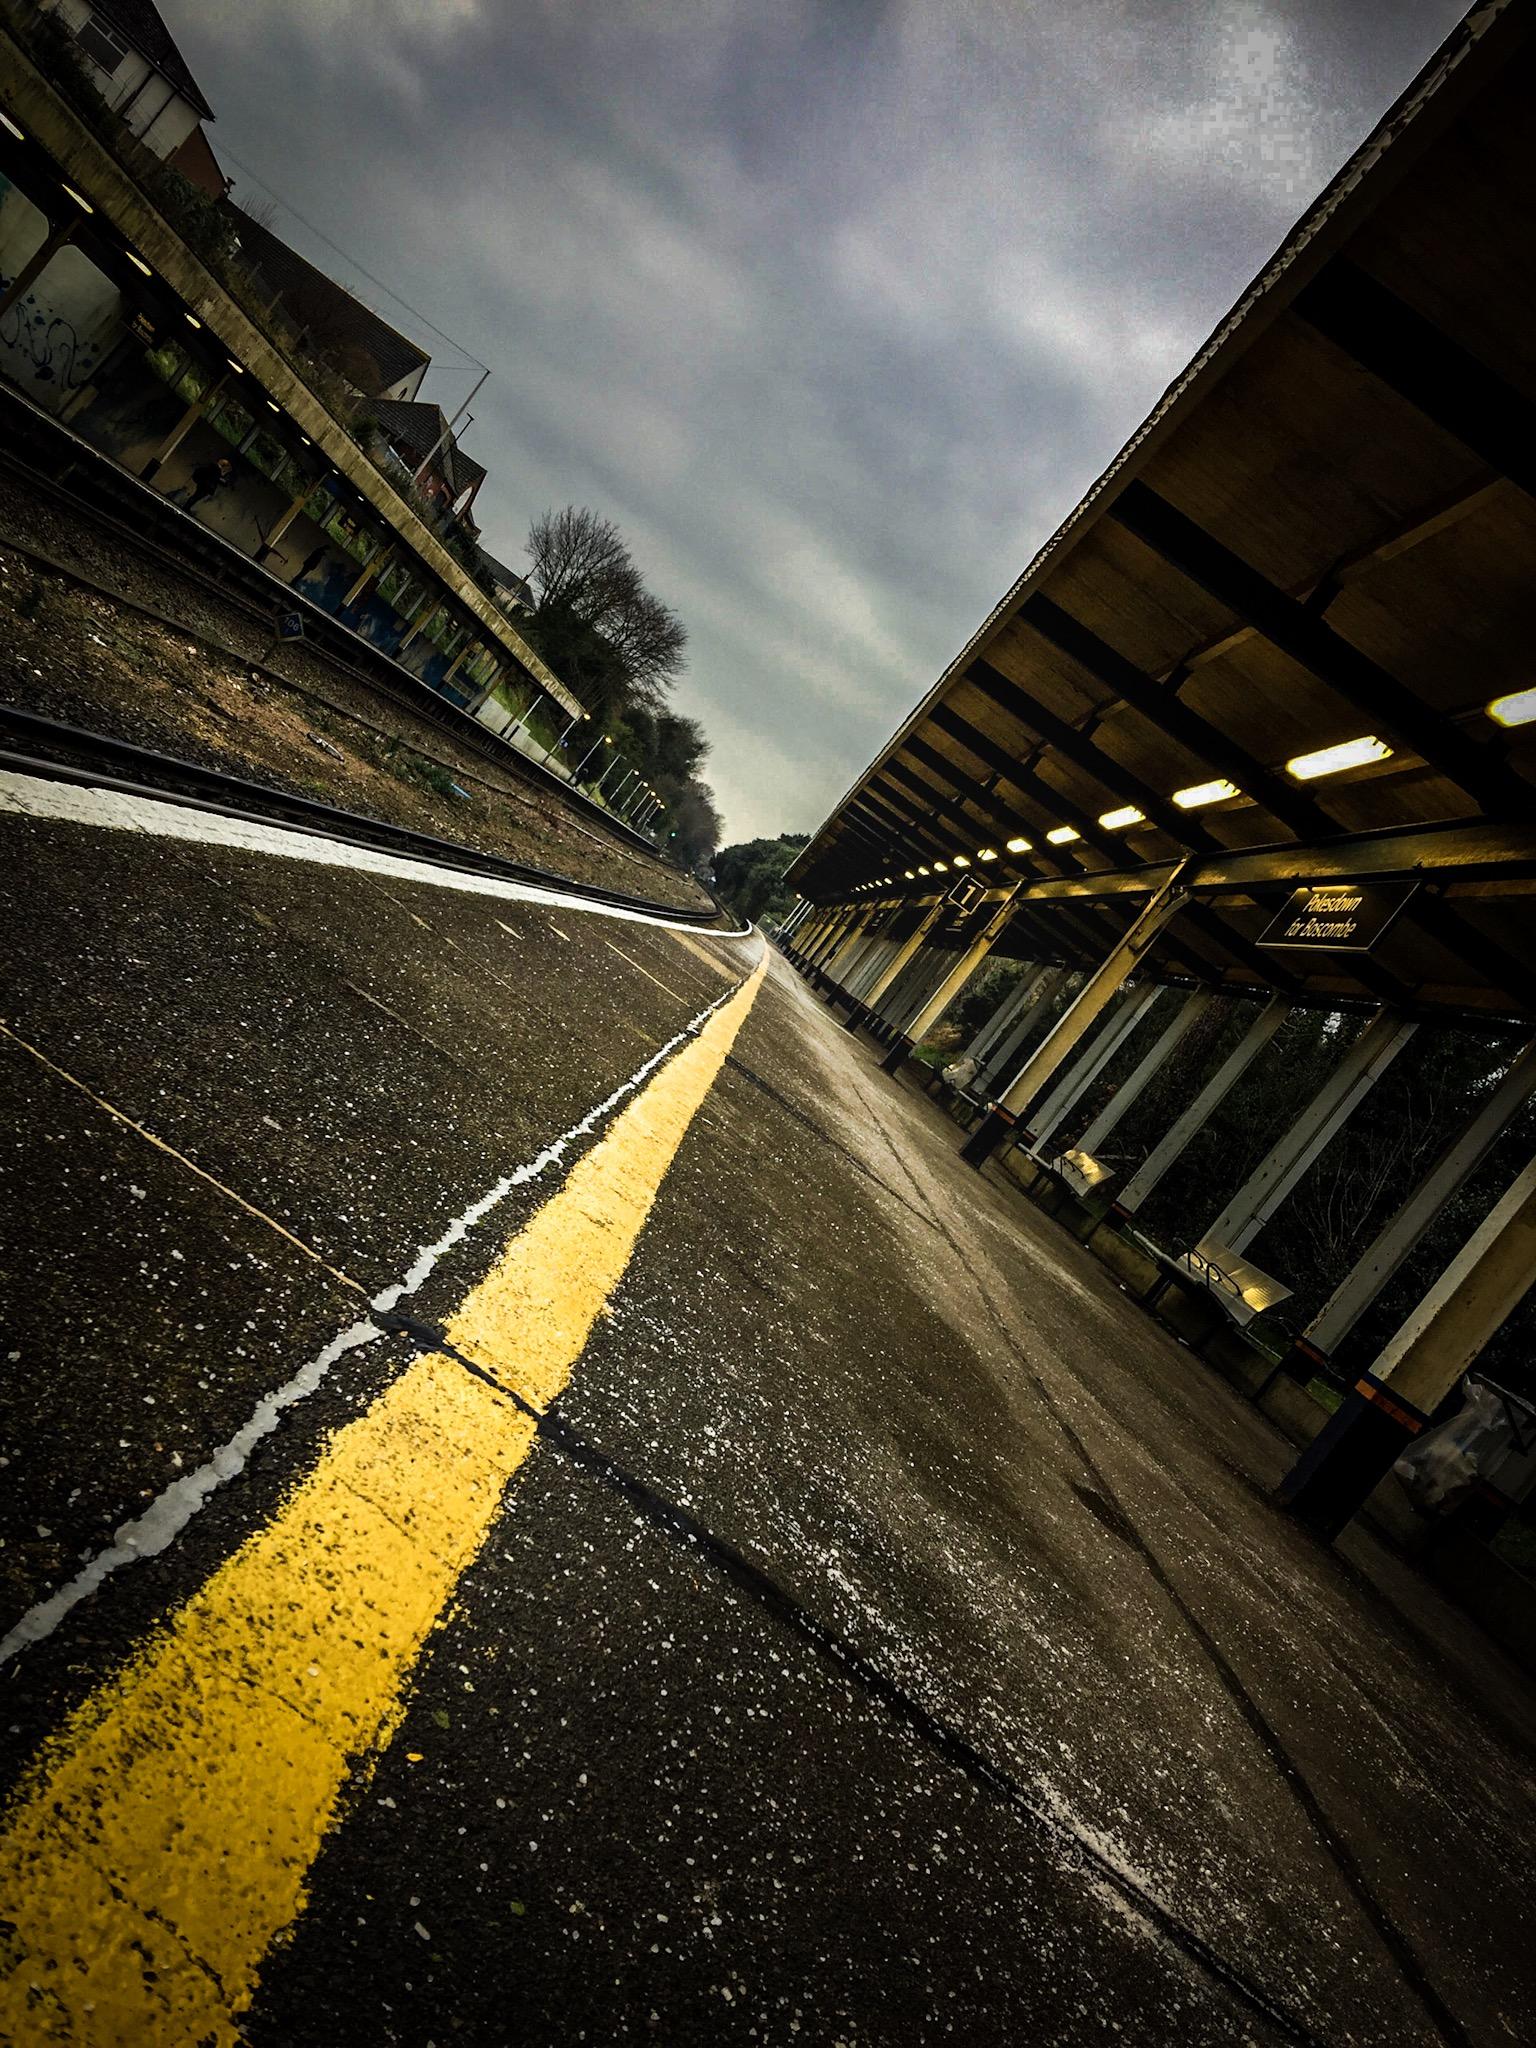 Pokesdown Station by Bournemouth Photographer Rick McEvoy